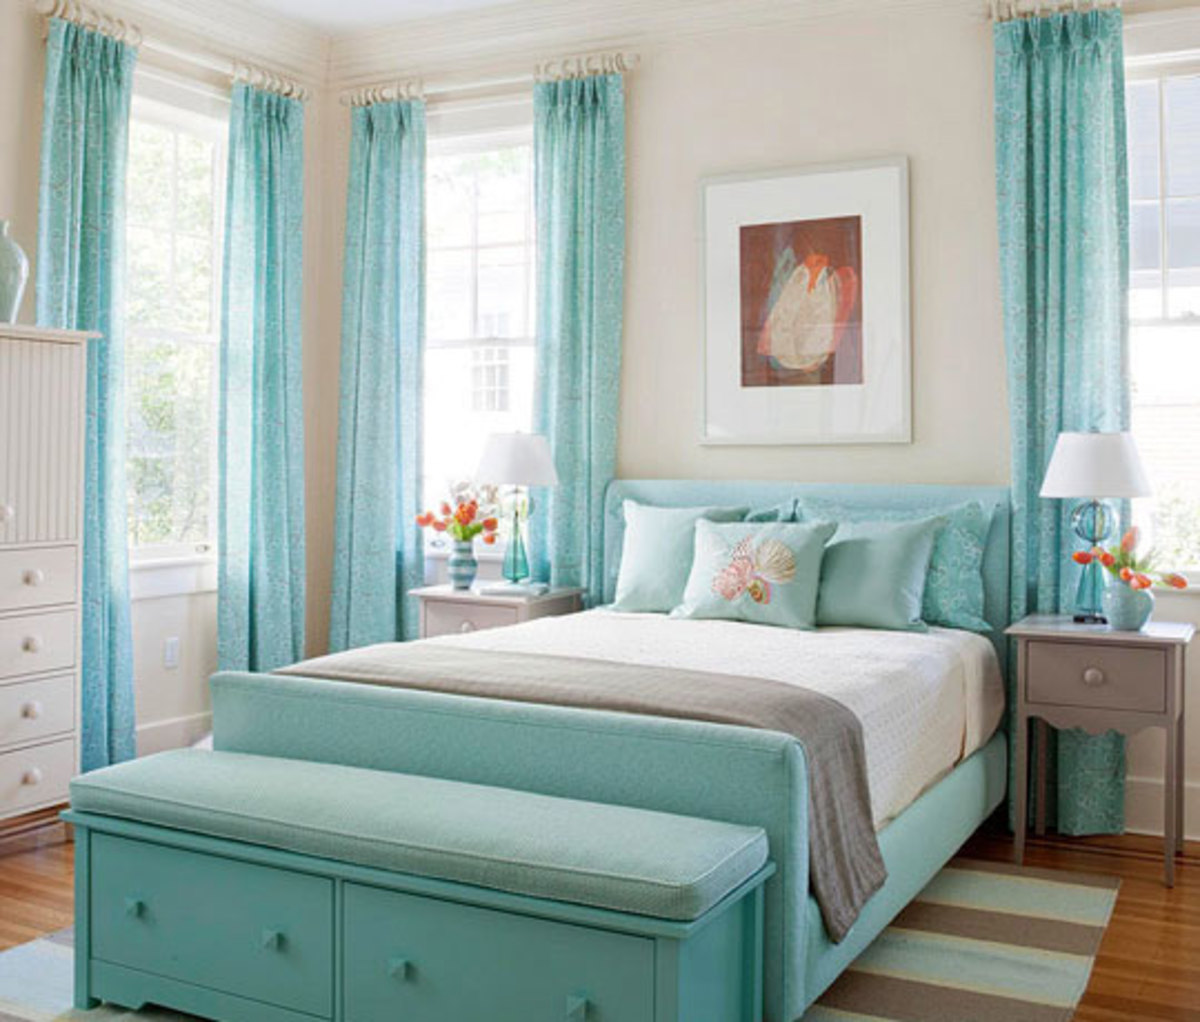 DIY Teen Girl Bedroom Decorating Ideas    Decor Ideas for Girls Room